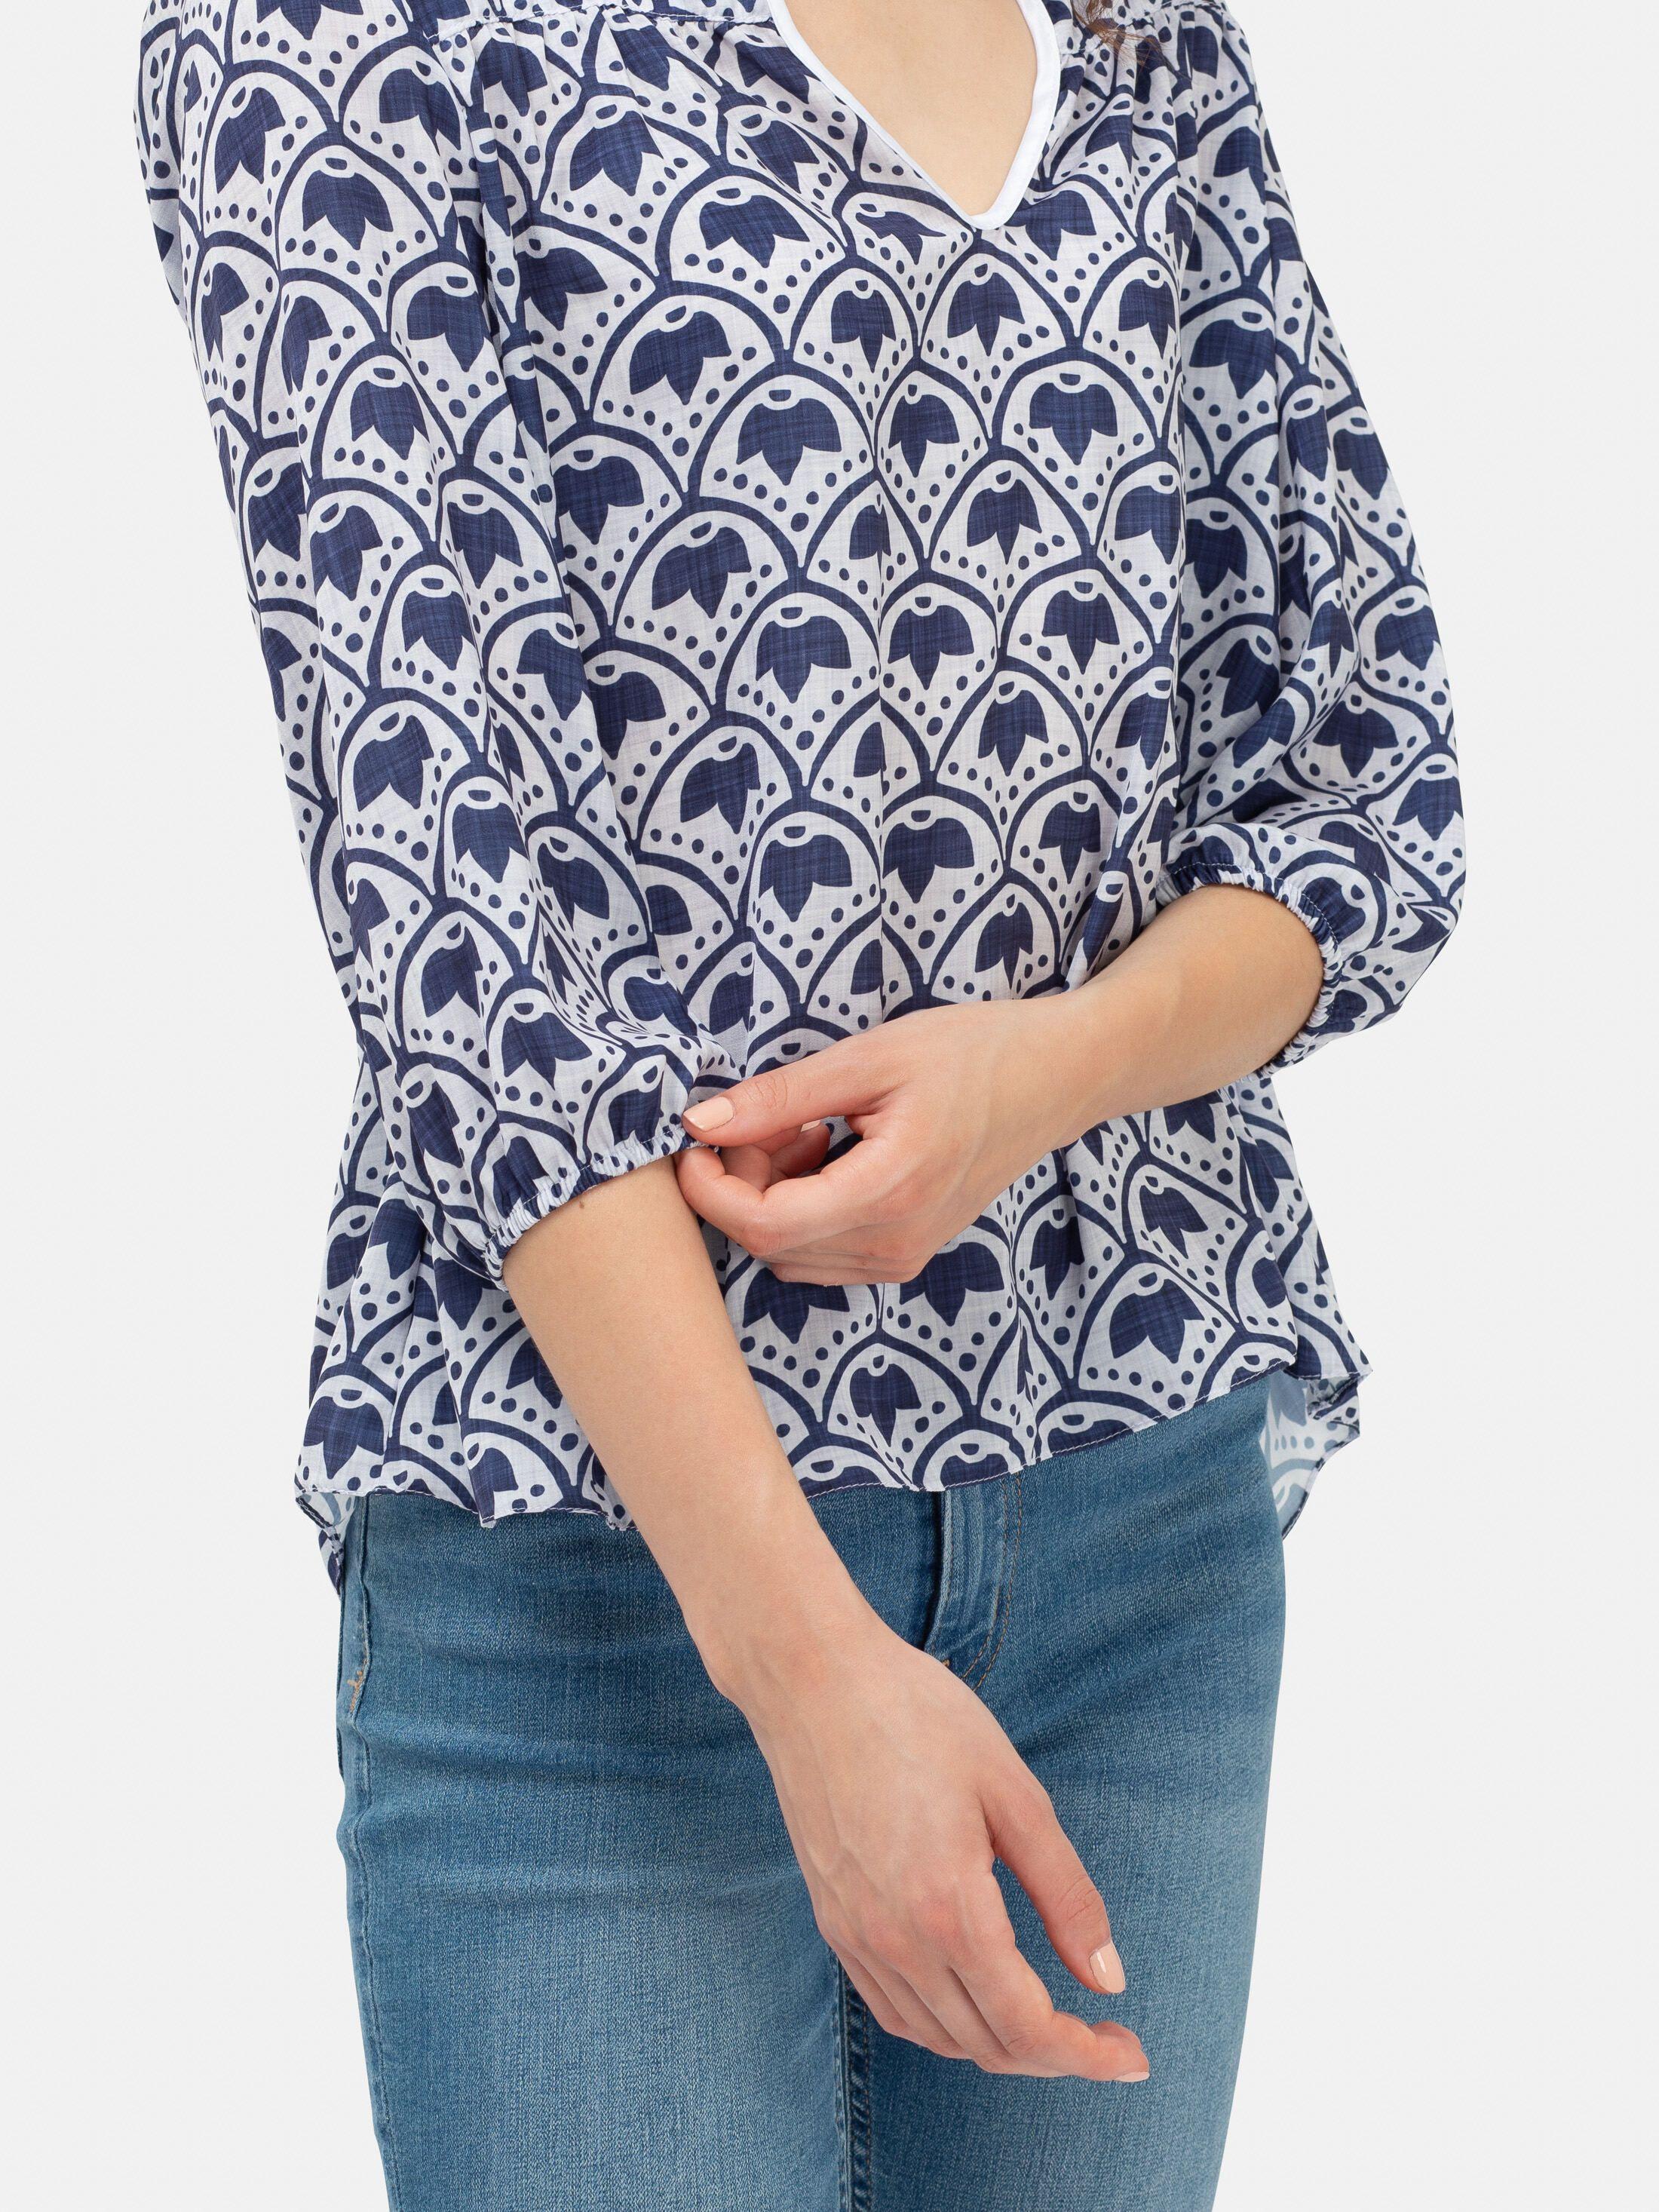 printed blouses detail